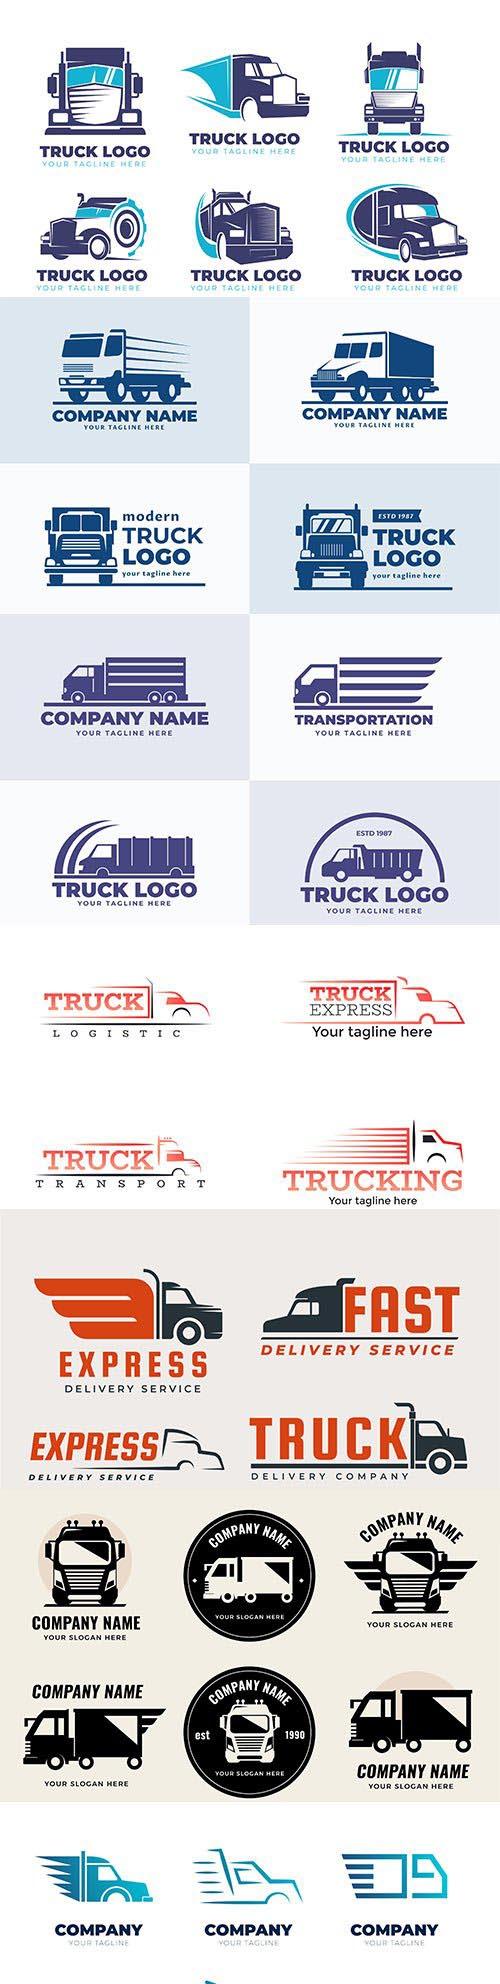 Truck logo vector design